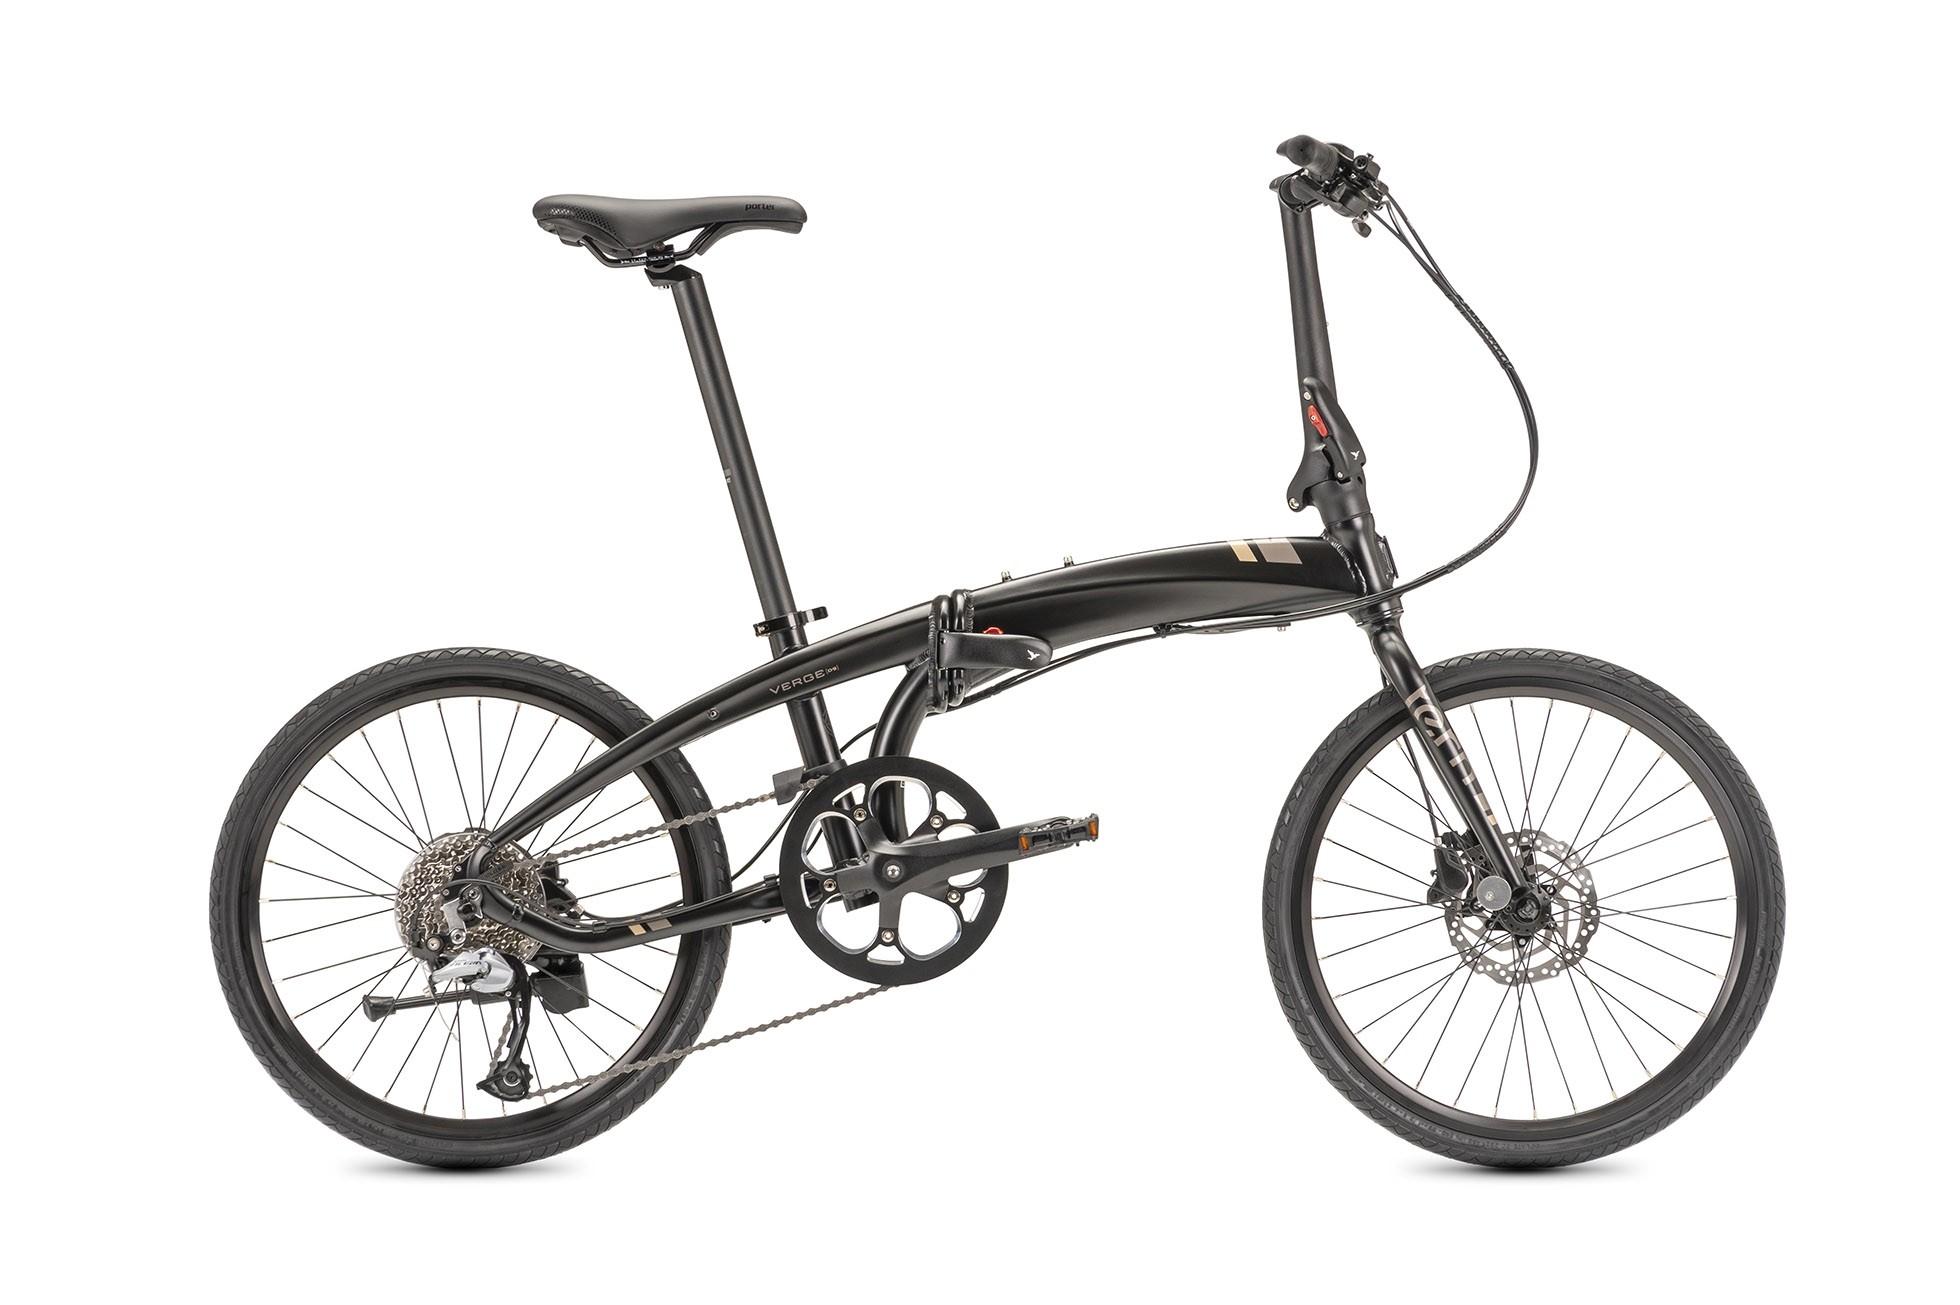 TERN Verge D9 Black - Disponible fin mars 2021